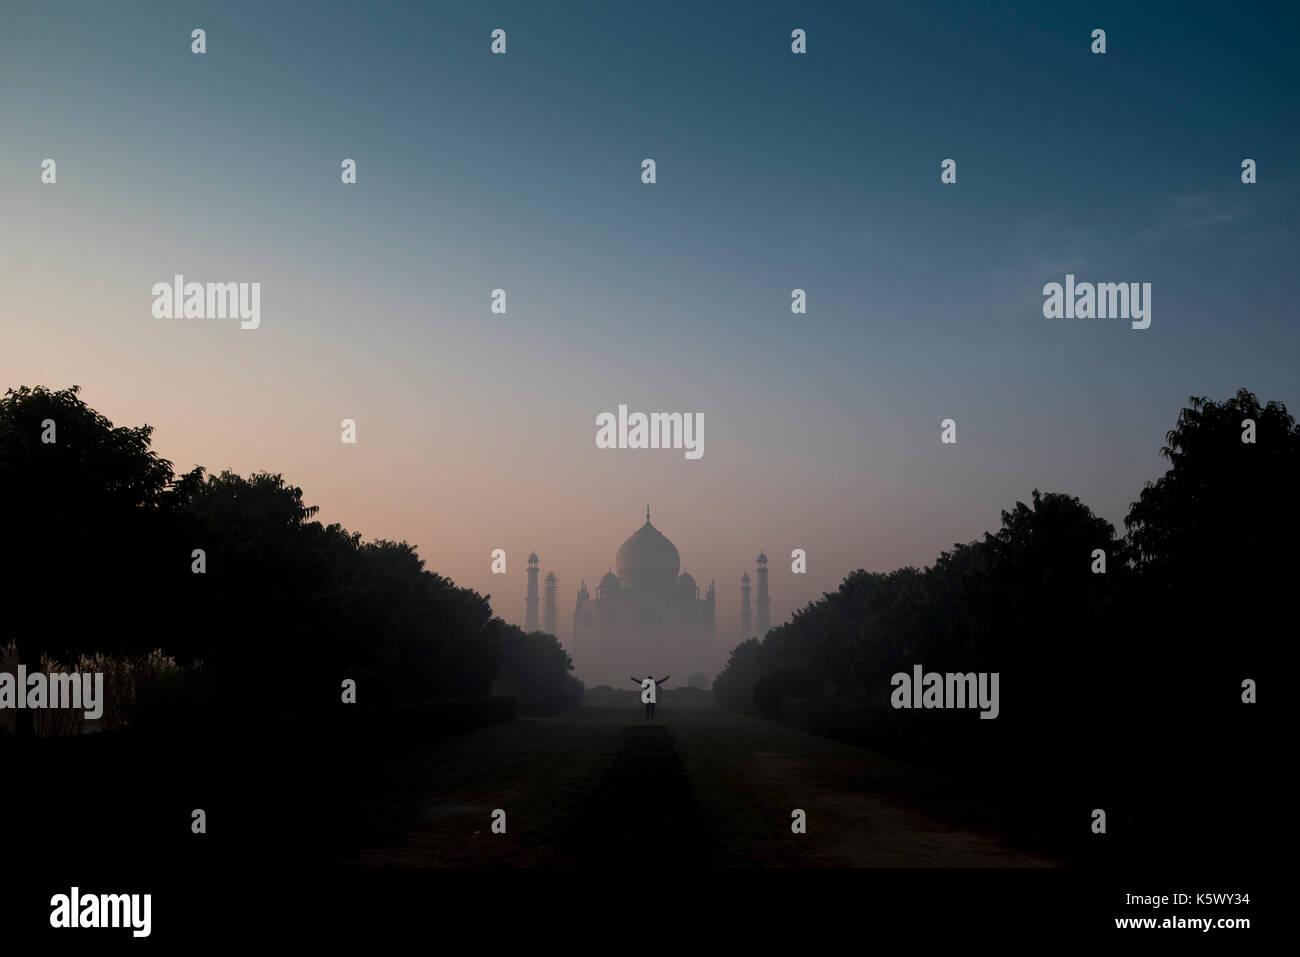 Taj Mahal at Dawn - Stock Image